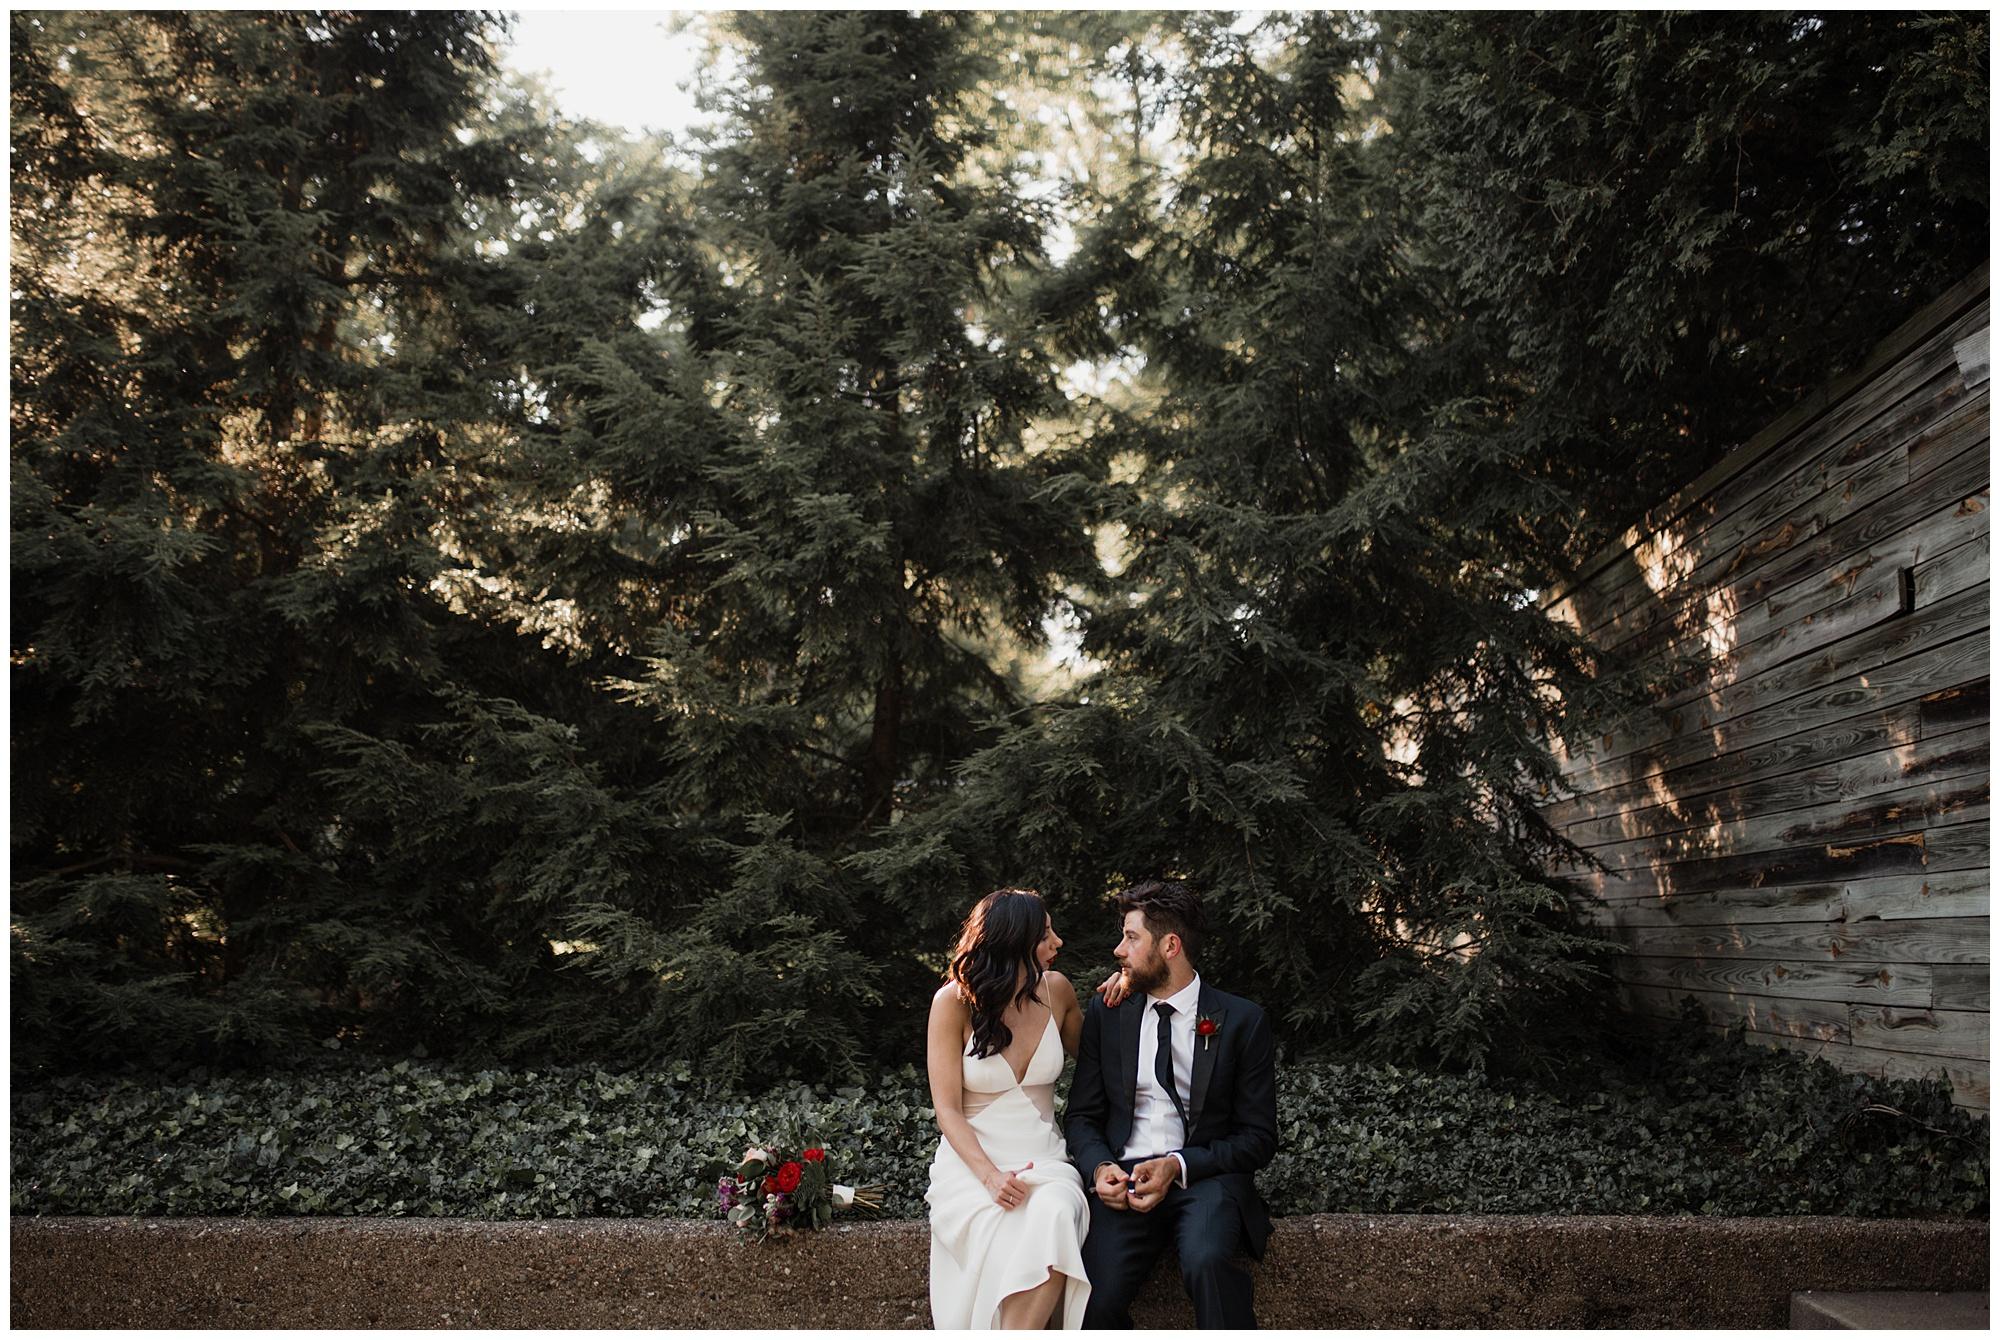 allerton_park_wedding_champaign_il_chicago_wright_photographs_ne_0098.jpg